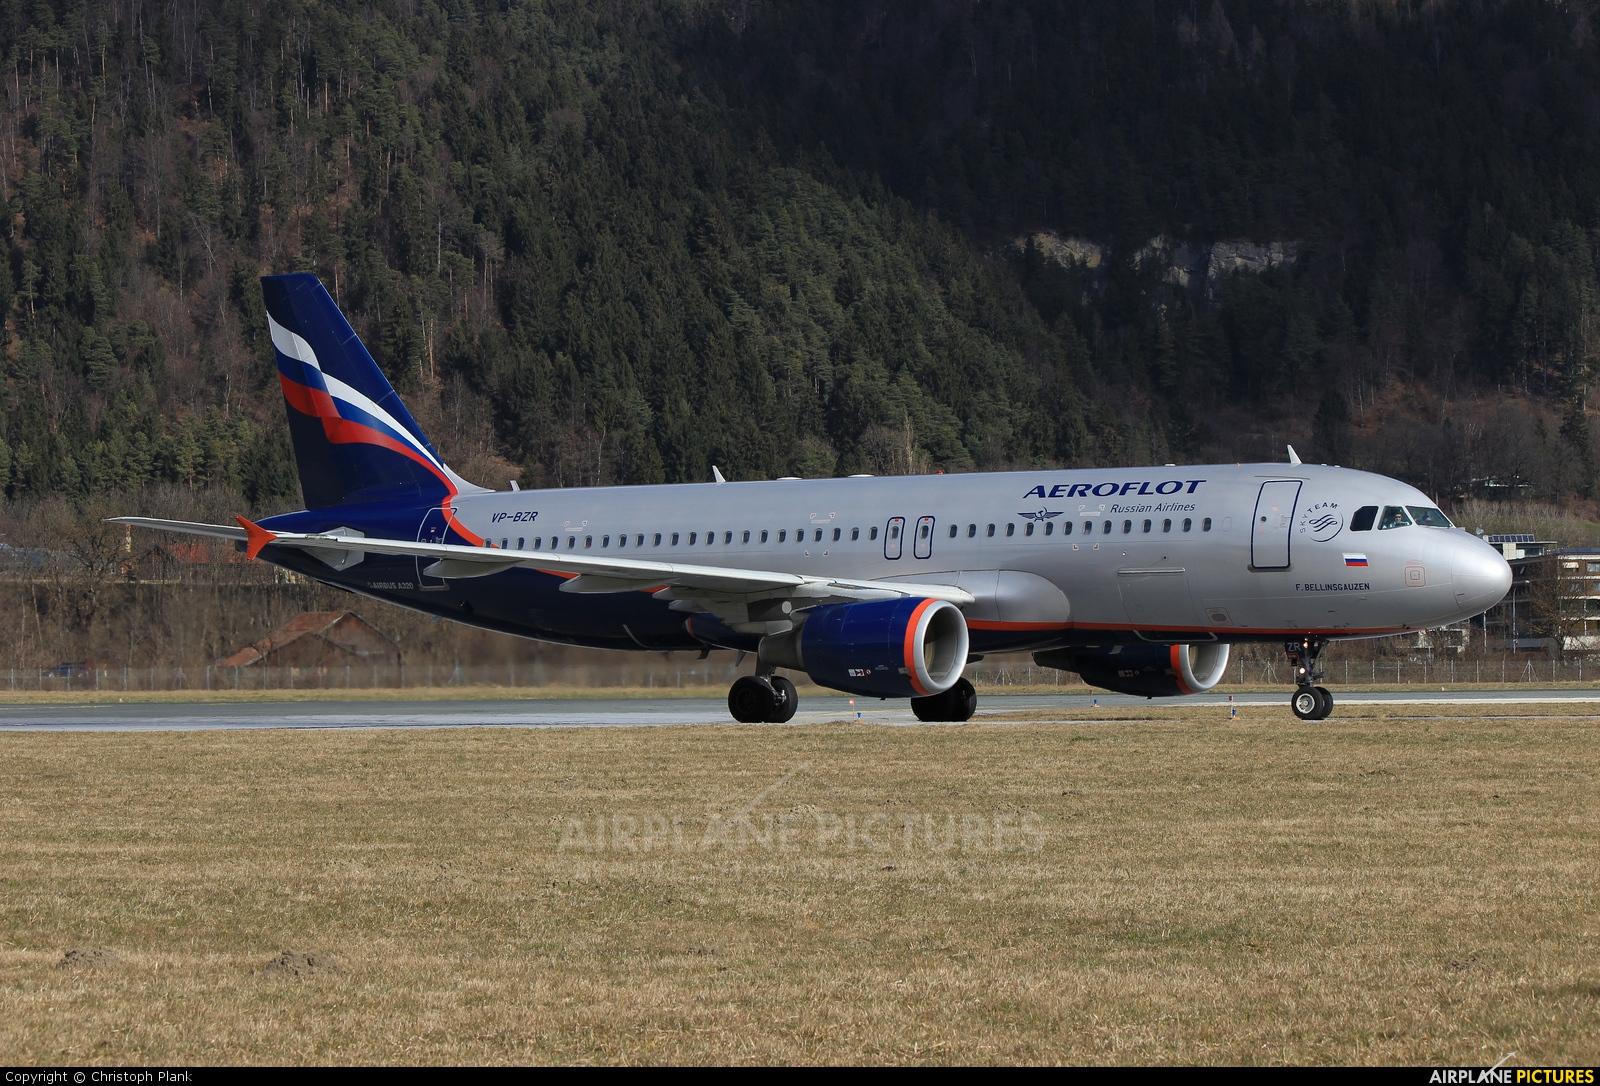 Aeroflot VP-BZR aircraft at Innsbruck